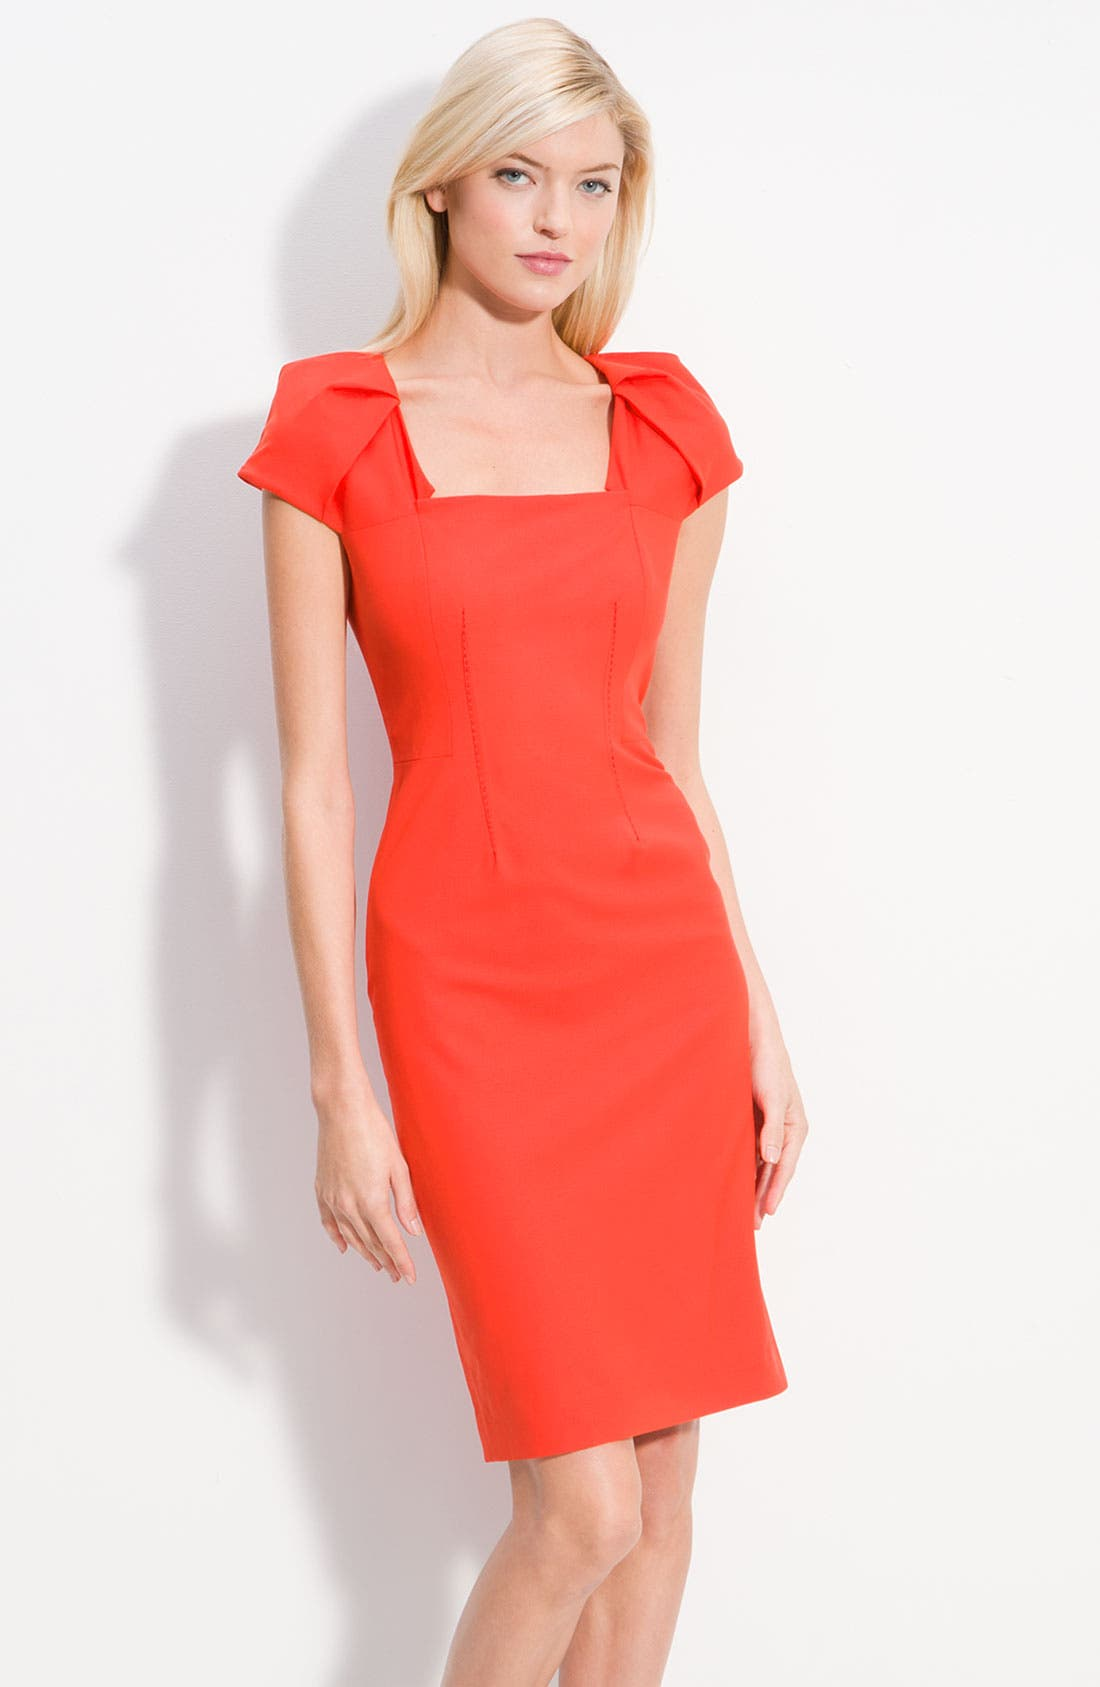 Alternate Image 1 Selected - Rachel Roy Origami Cap Sleeve Fitted Dress